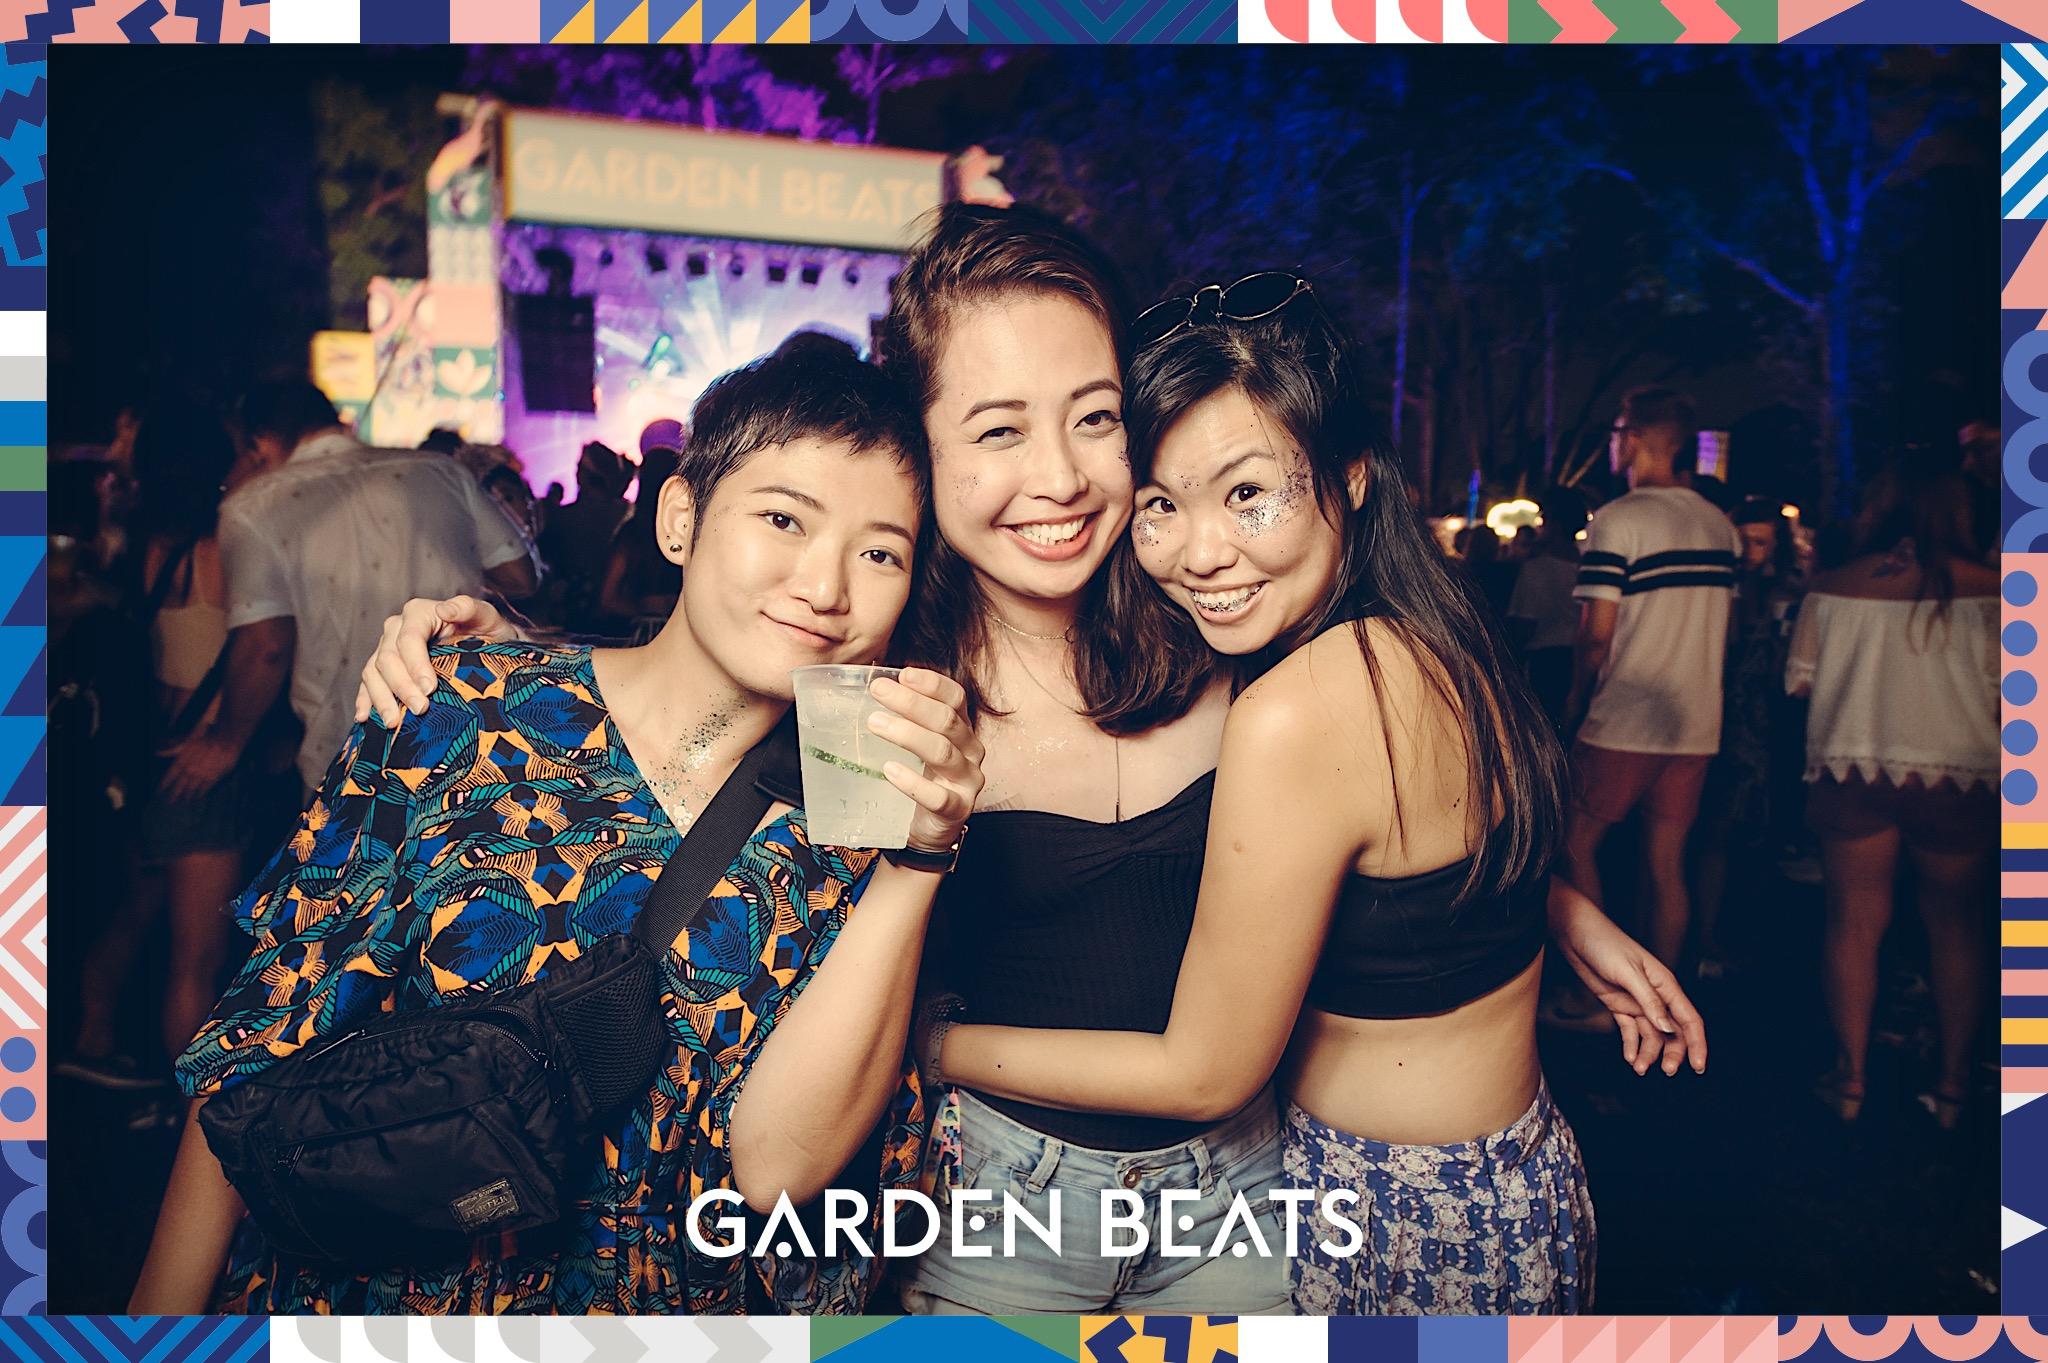 03032018_GardenBeats_Colossal951_Watermarked.jpg